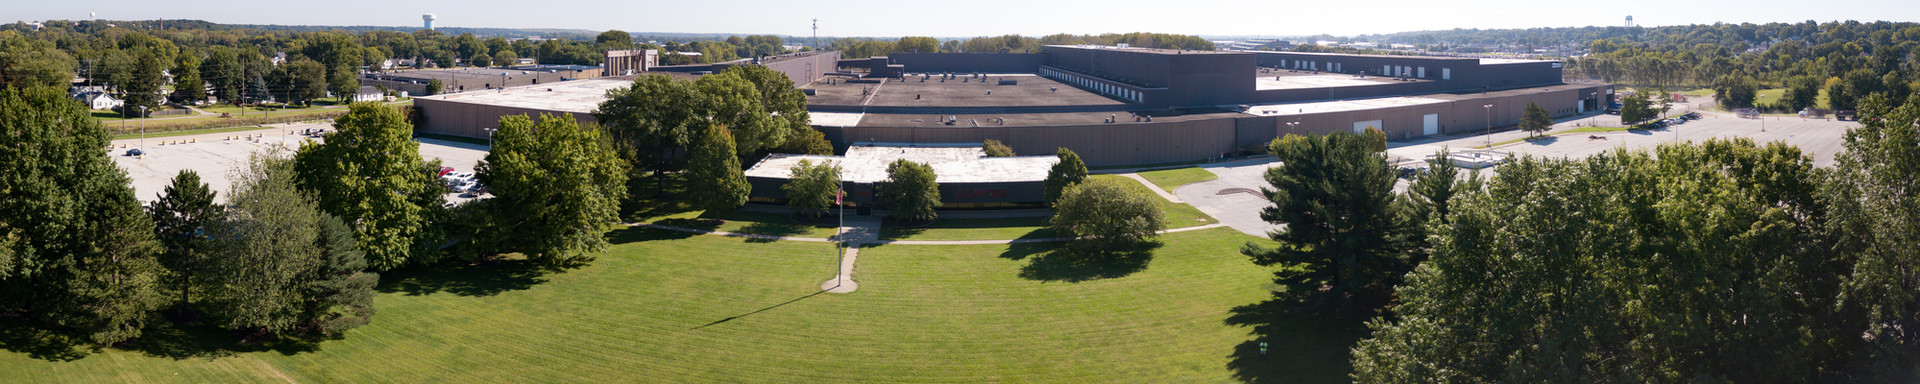 River Bend Industrial Center